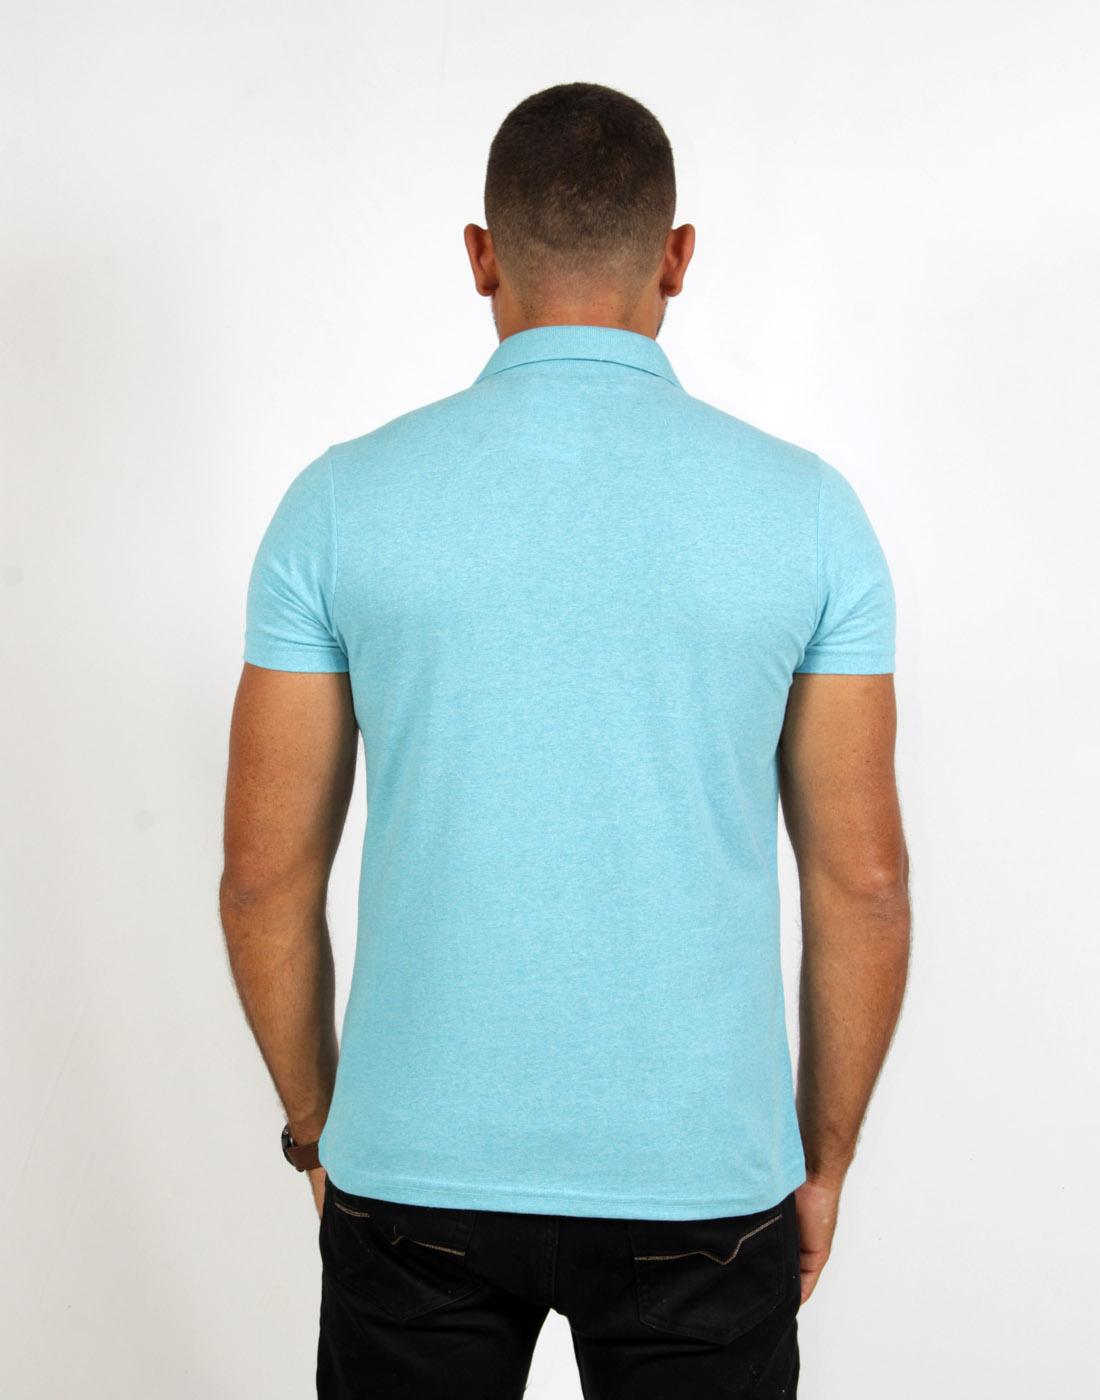 Camiseta Polo Masc. Lisa Azul Claro Fatal